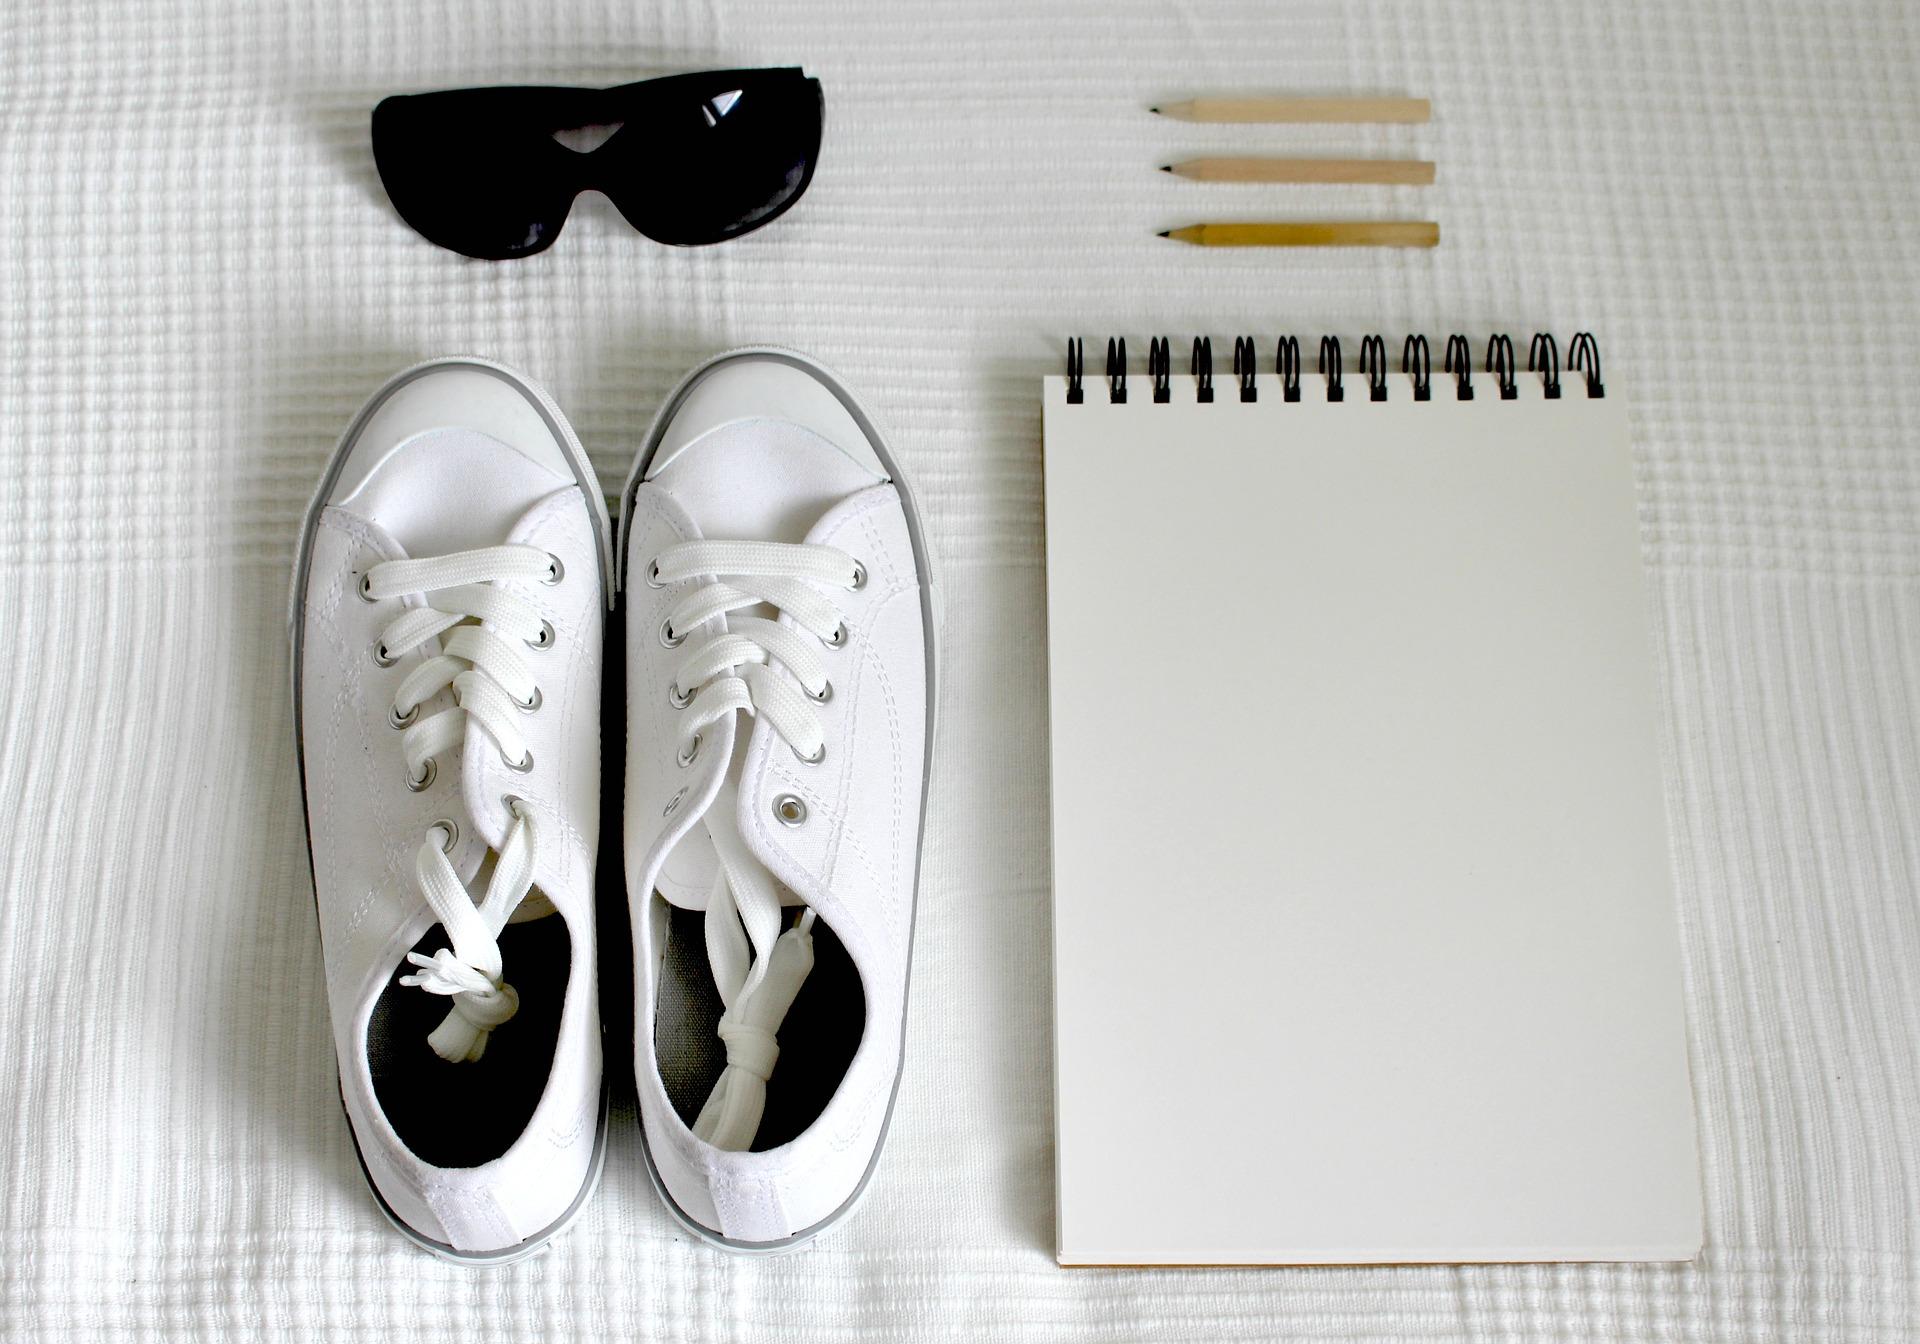 minimalism oggetti utili